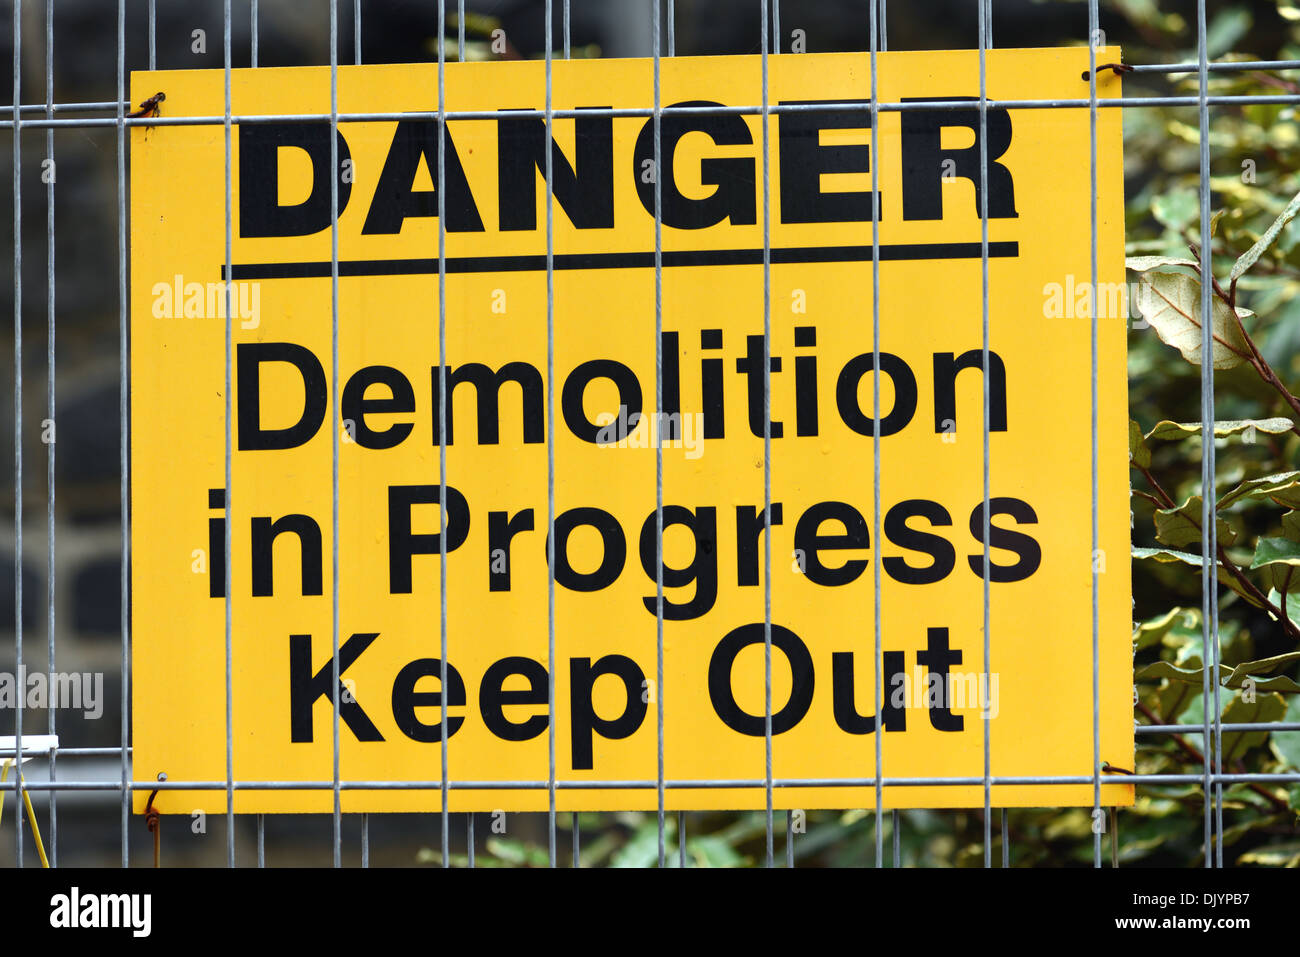 Building site sign: Danger Demolition in progress - Keep Out - Stock Image